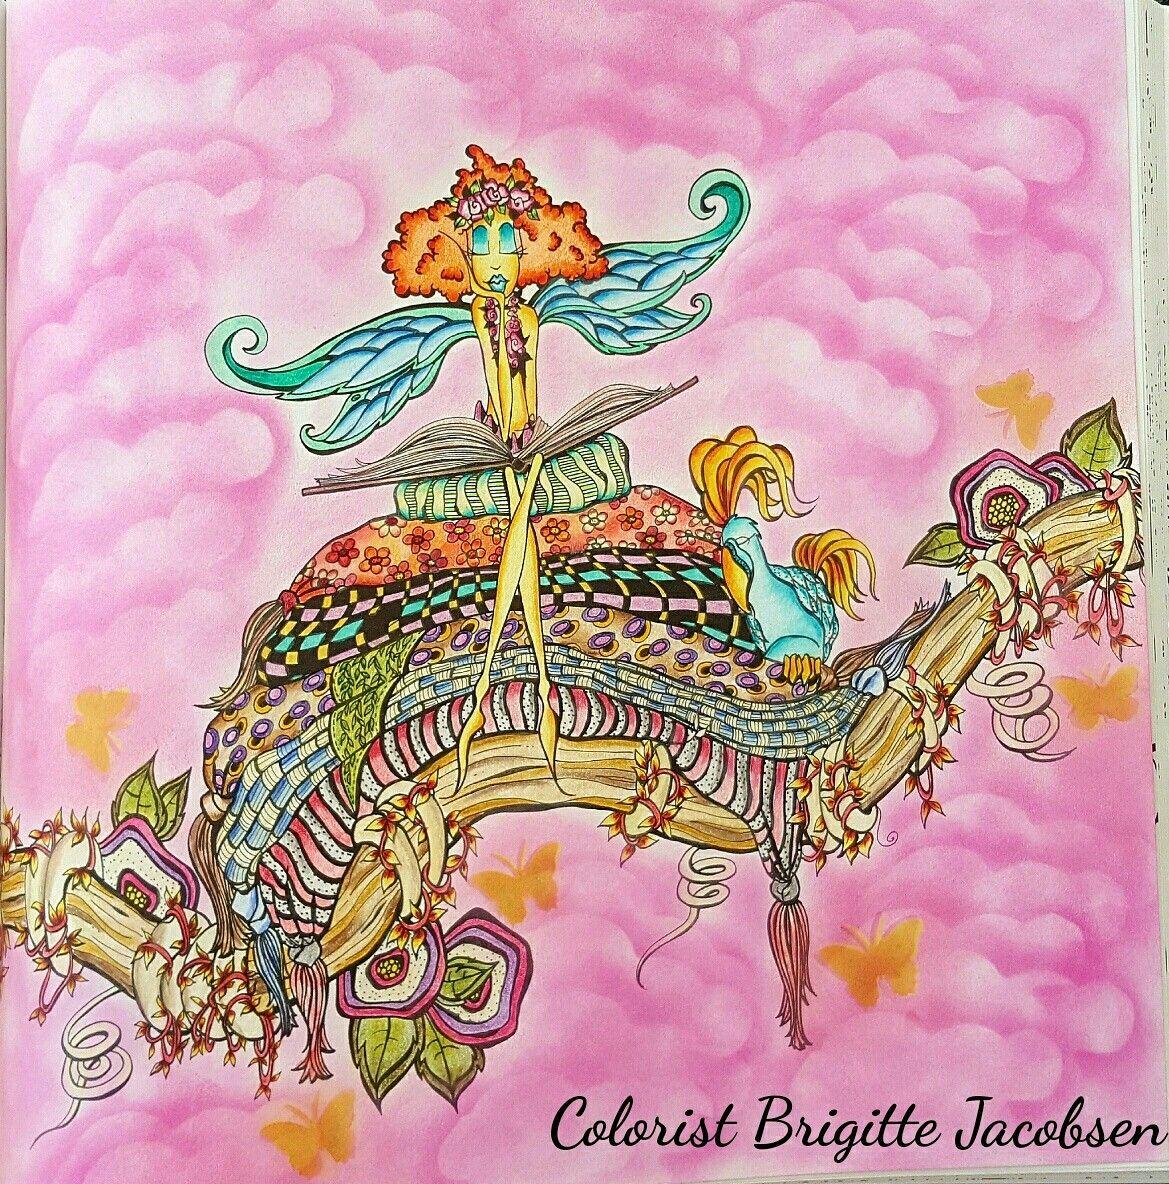 Zendoodle coloring enchanting gardens - Zendoodle Coloring Presents Fairies In Dreamland An Artist S Coloring Book Amazon Co Uk Denyse Klette Books Coloring Pinterest Coloring Books